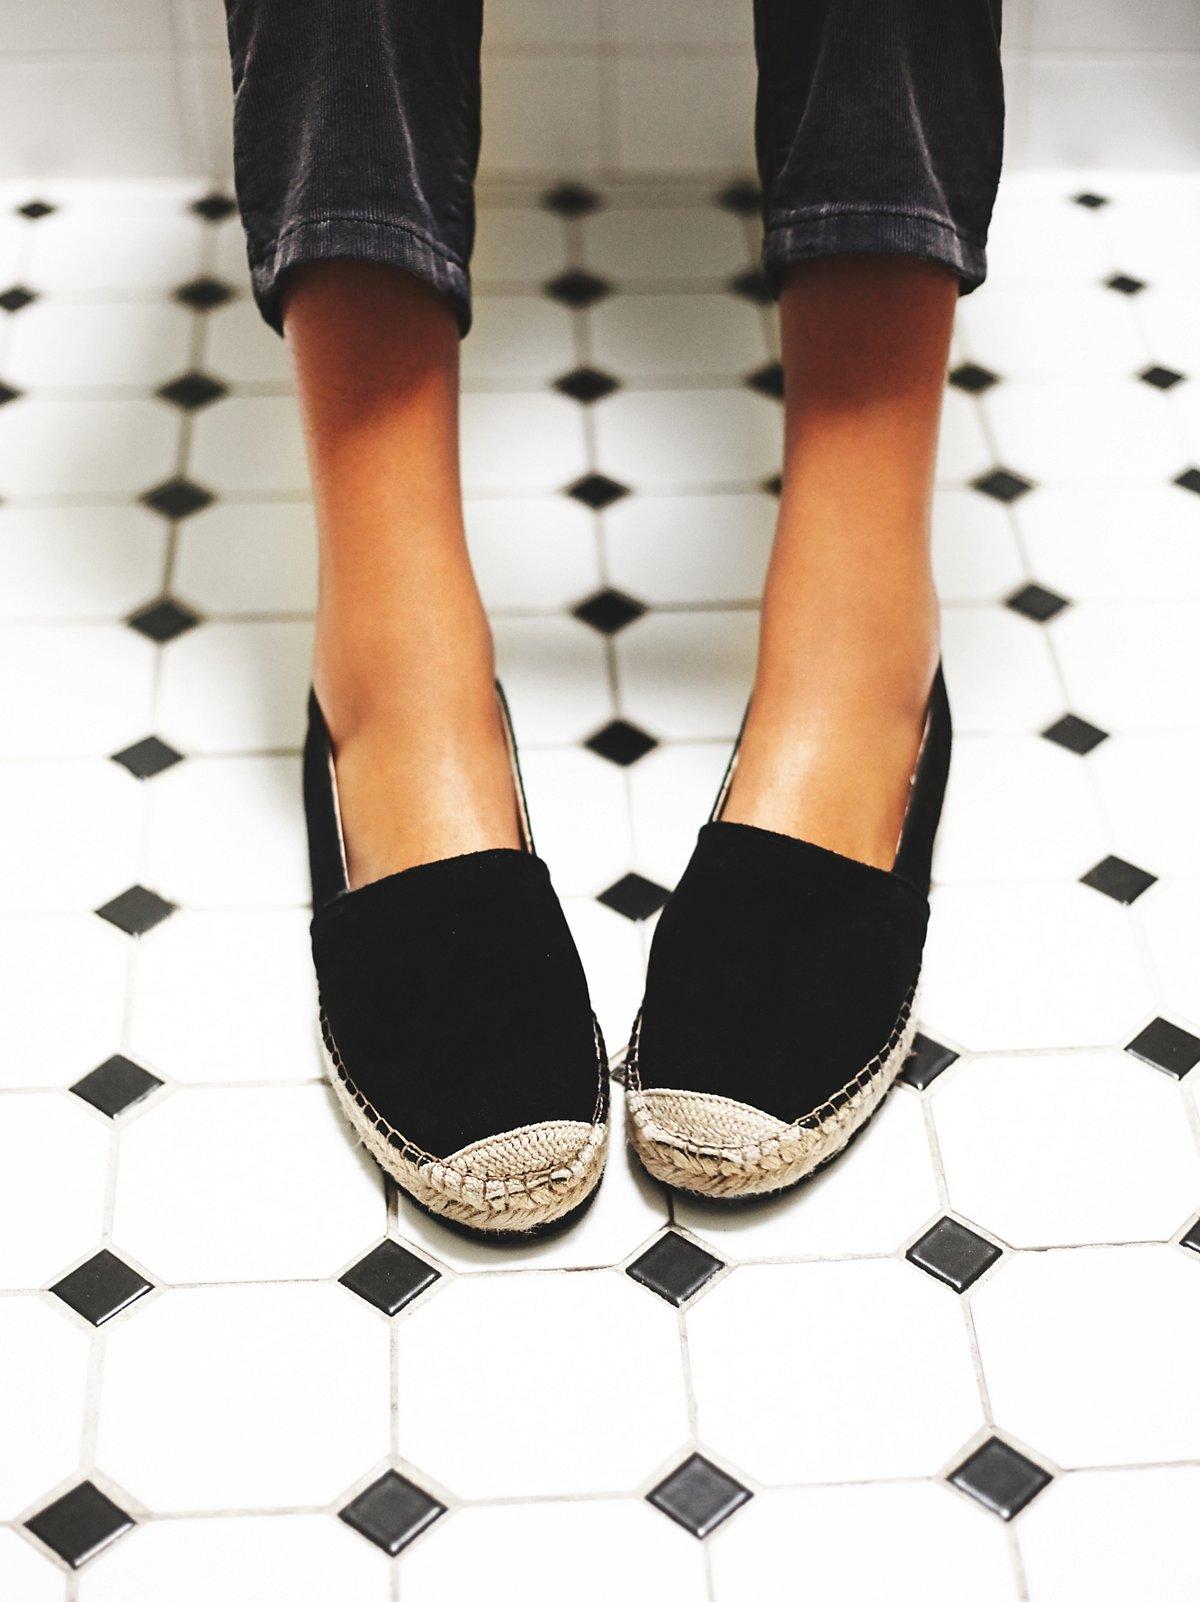 Palm帆布便鞋